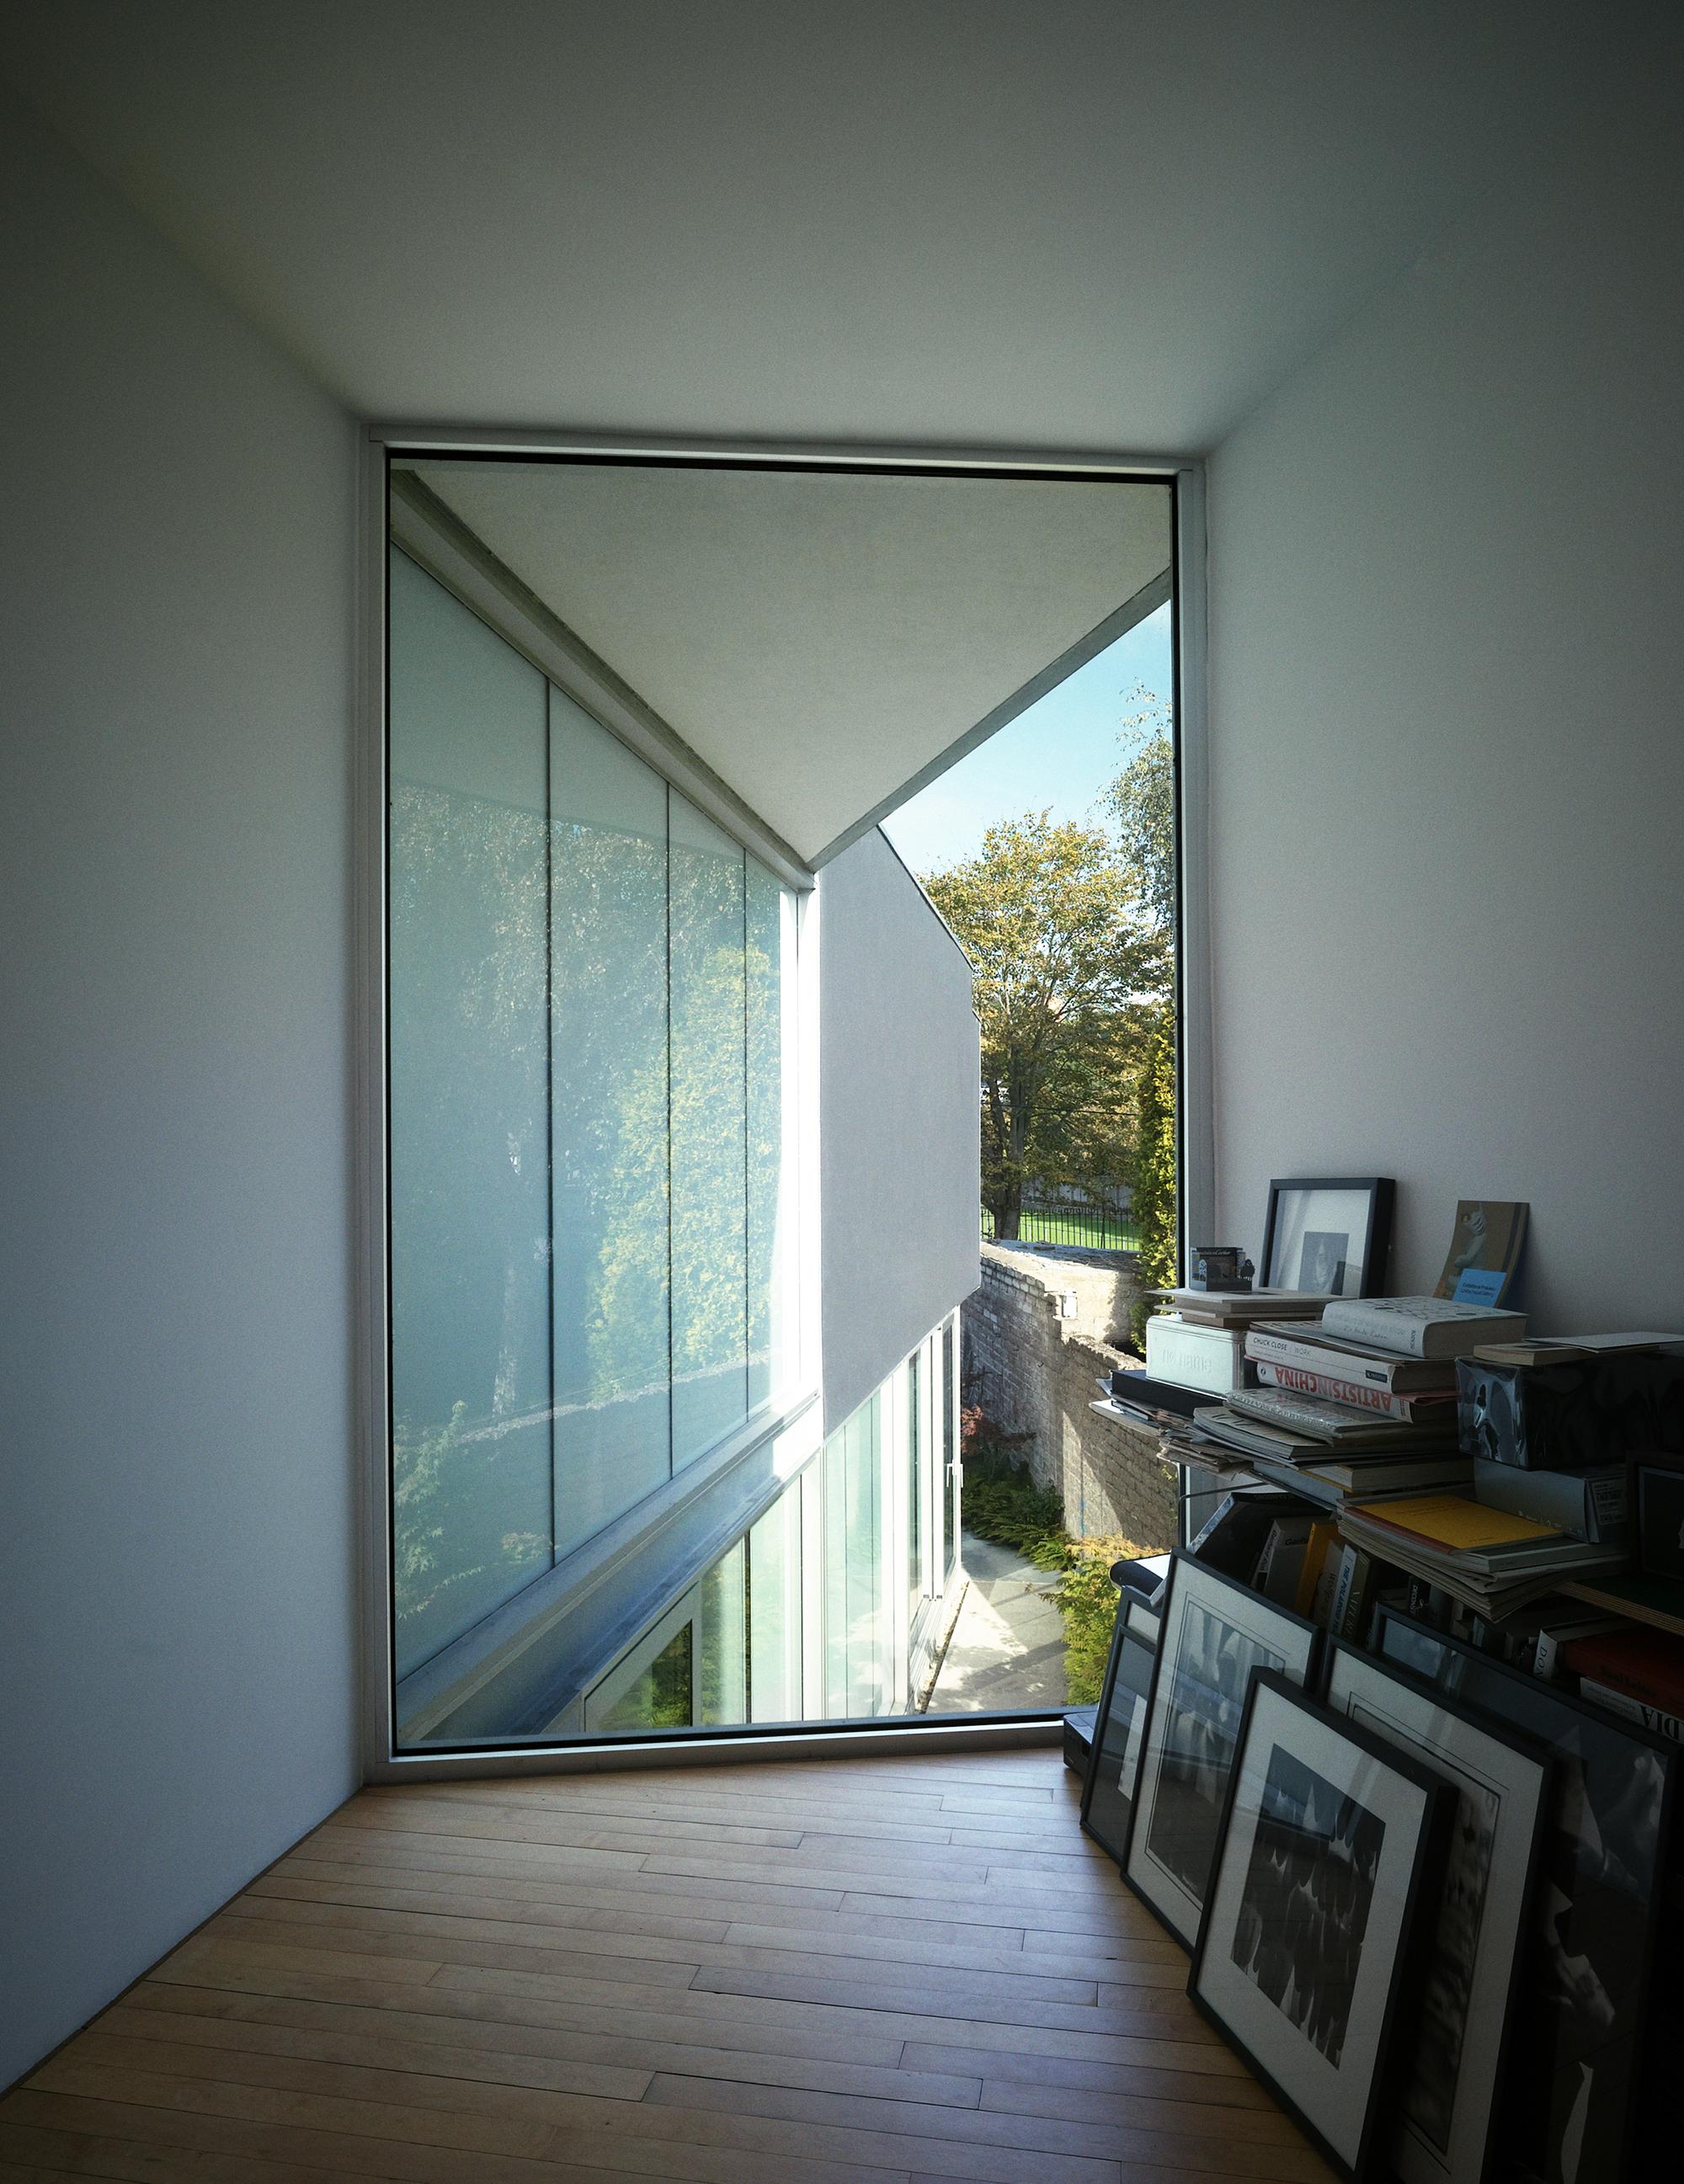 galer a de casa plegable a2 architects 11. Black Bedroom Furniture Sets. Home Design Ideas